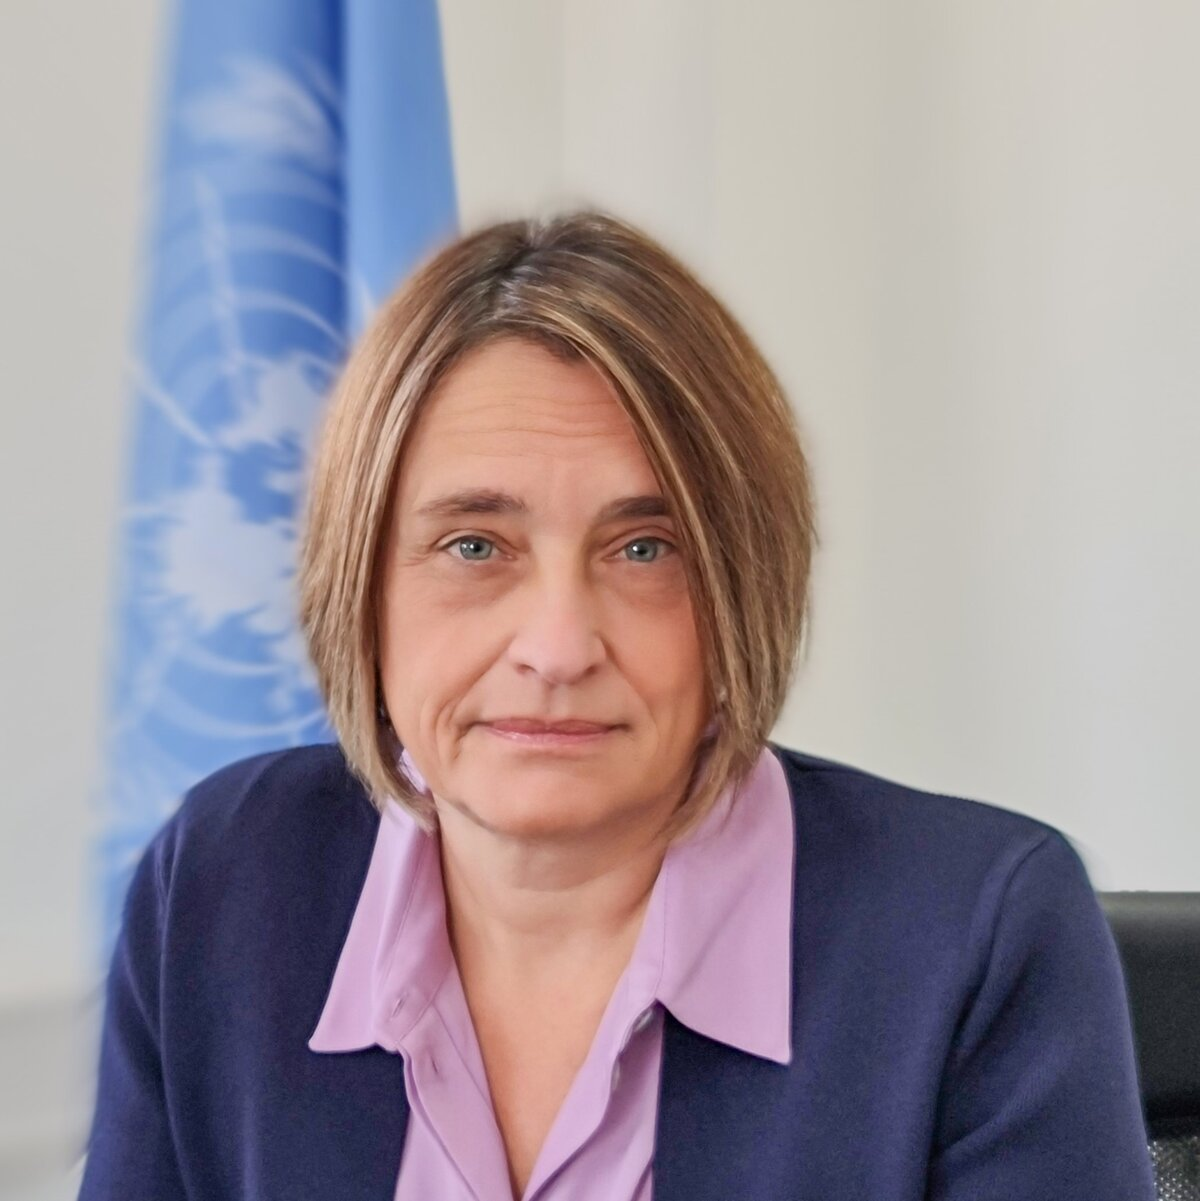 Lynn Hastings, UN Resident Coordinator